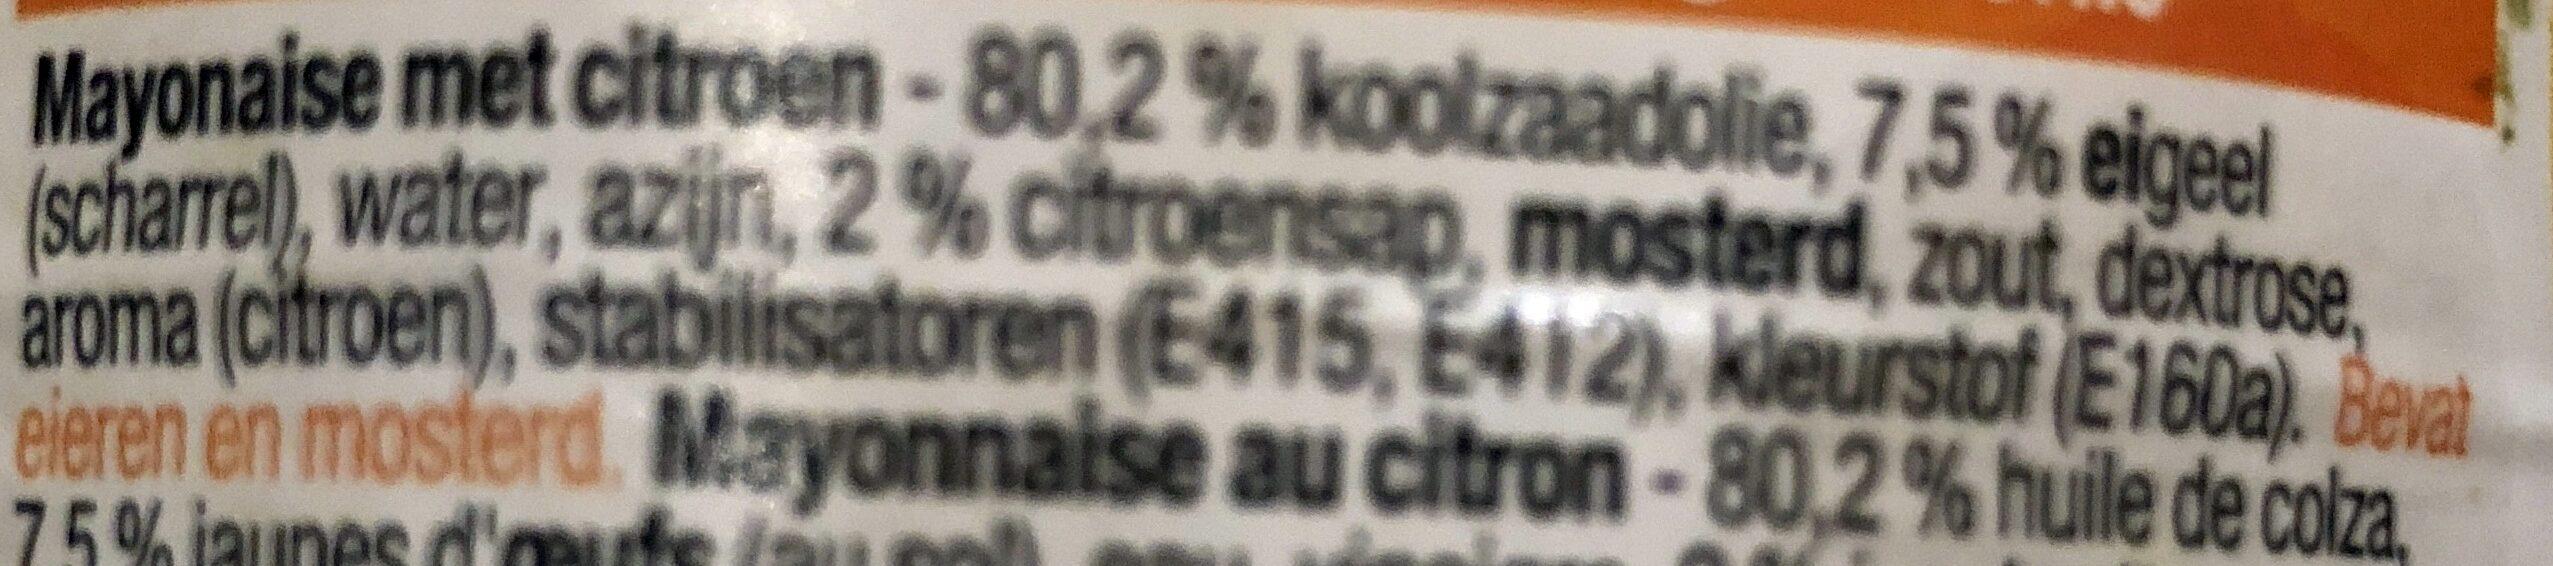 Mayonnaise - Ingrediënten - nl